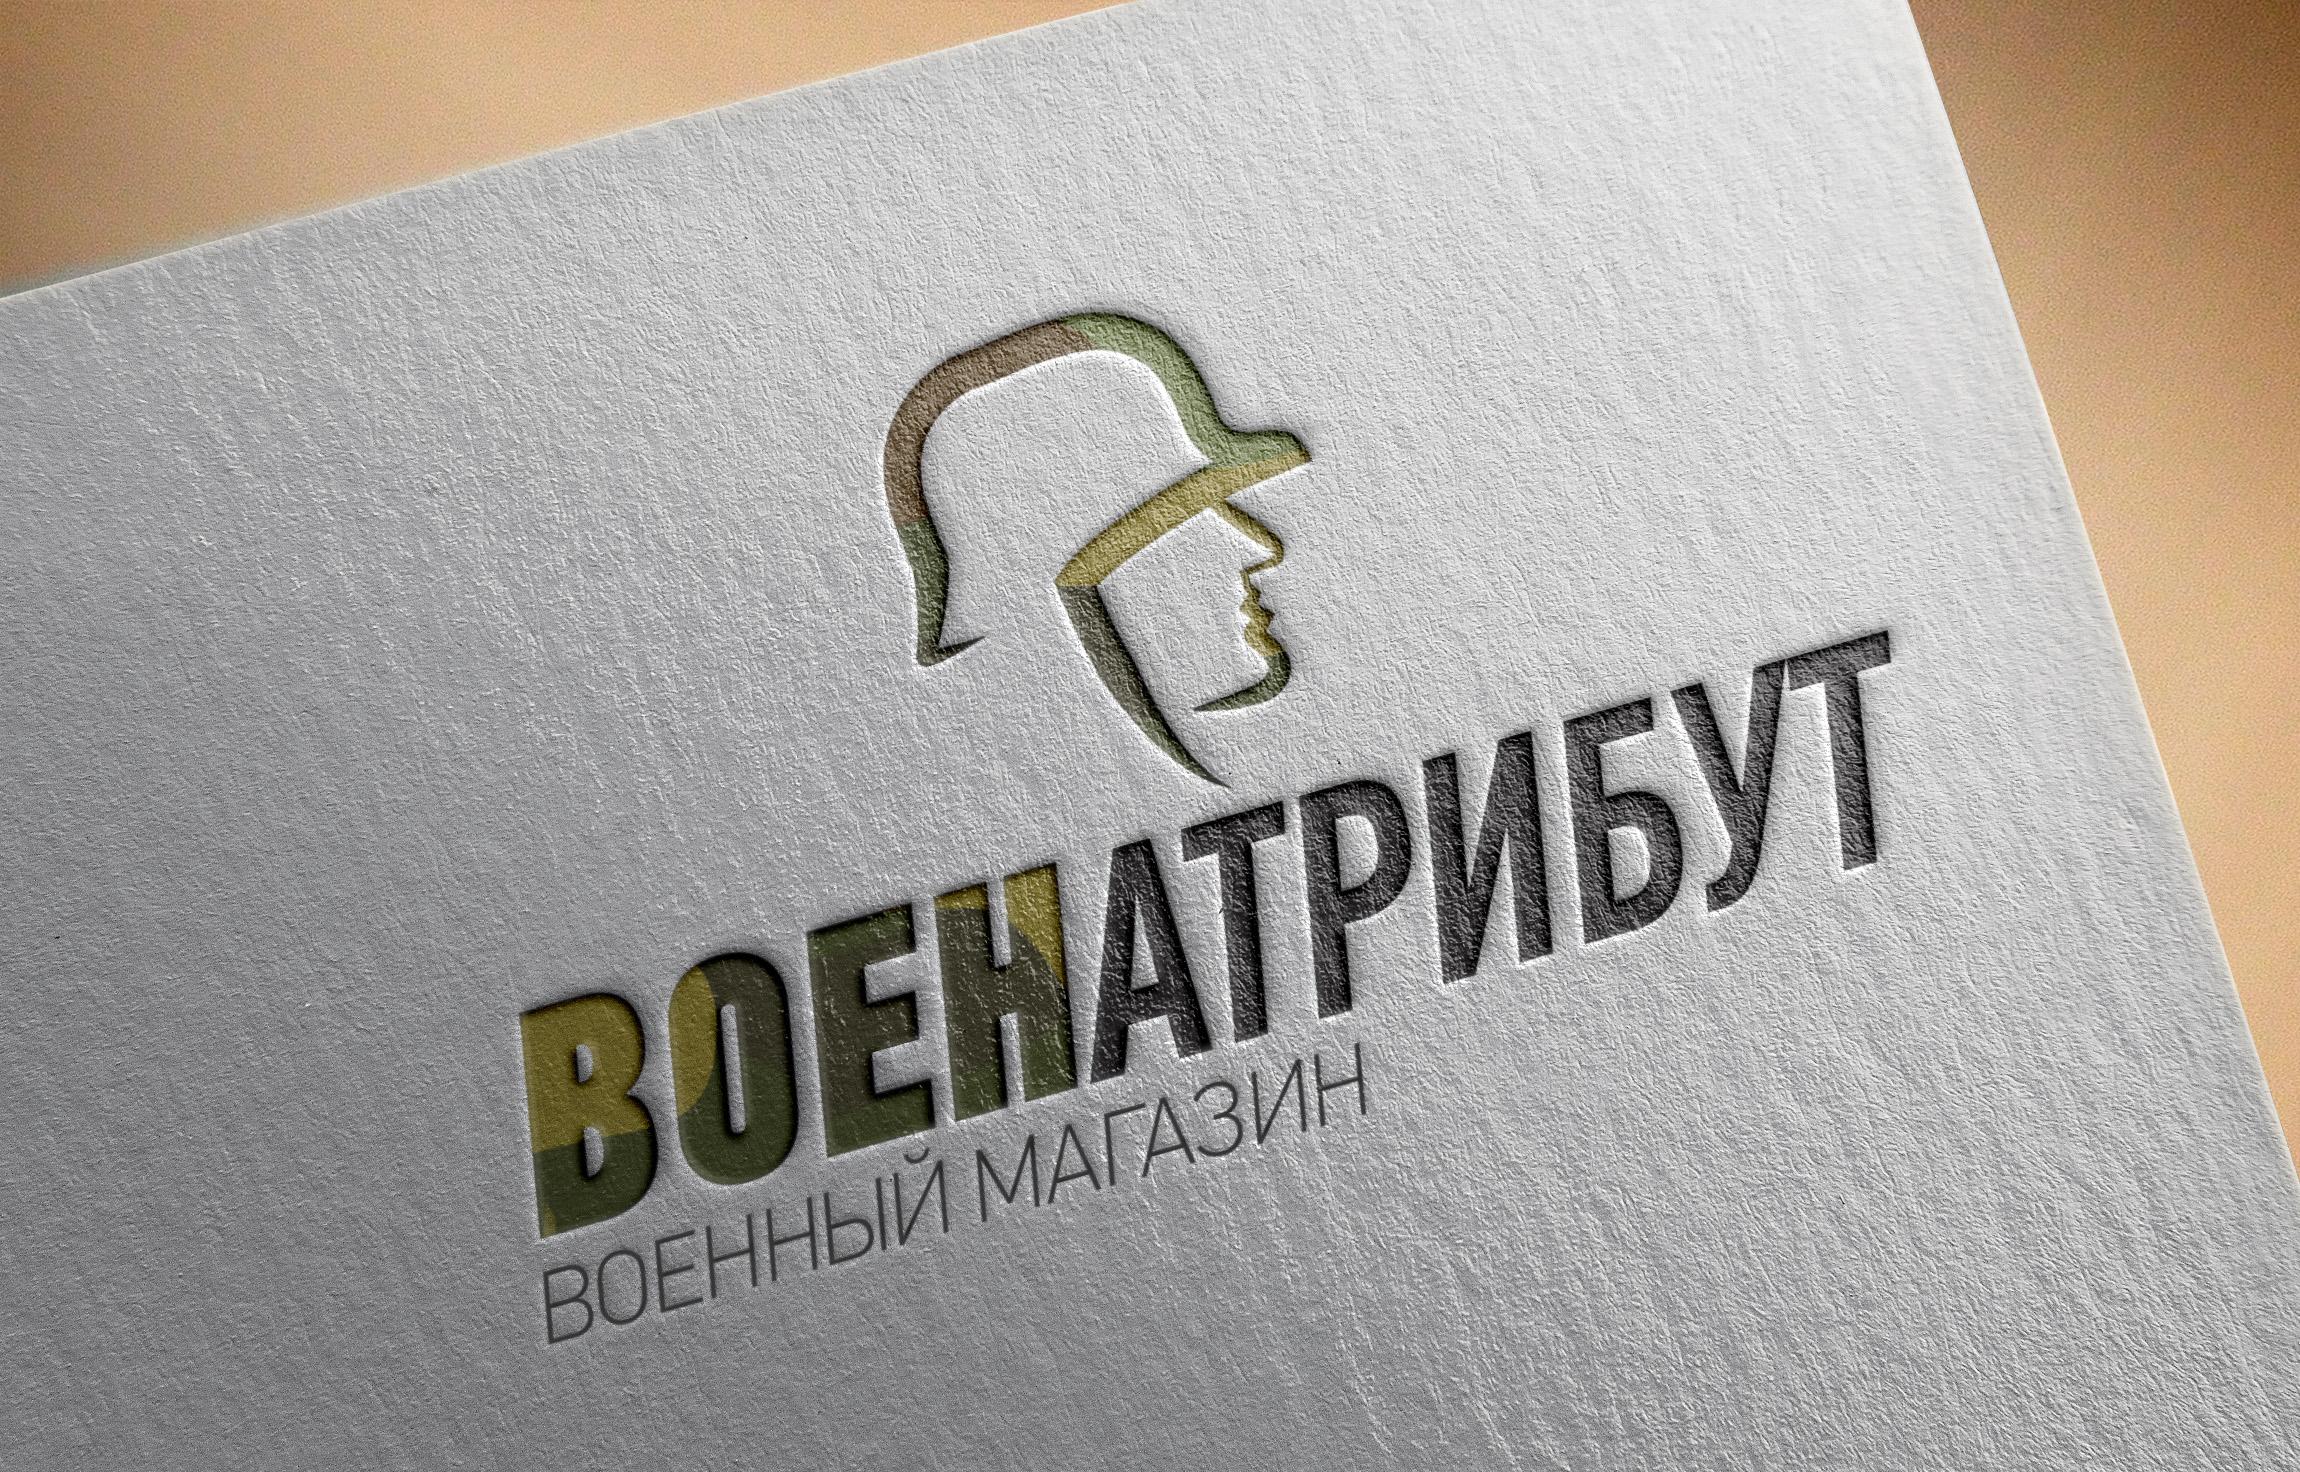 Разработка логотипа для компании военной тематики фото f_001601d748b775fa.jpg